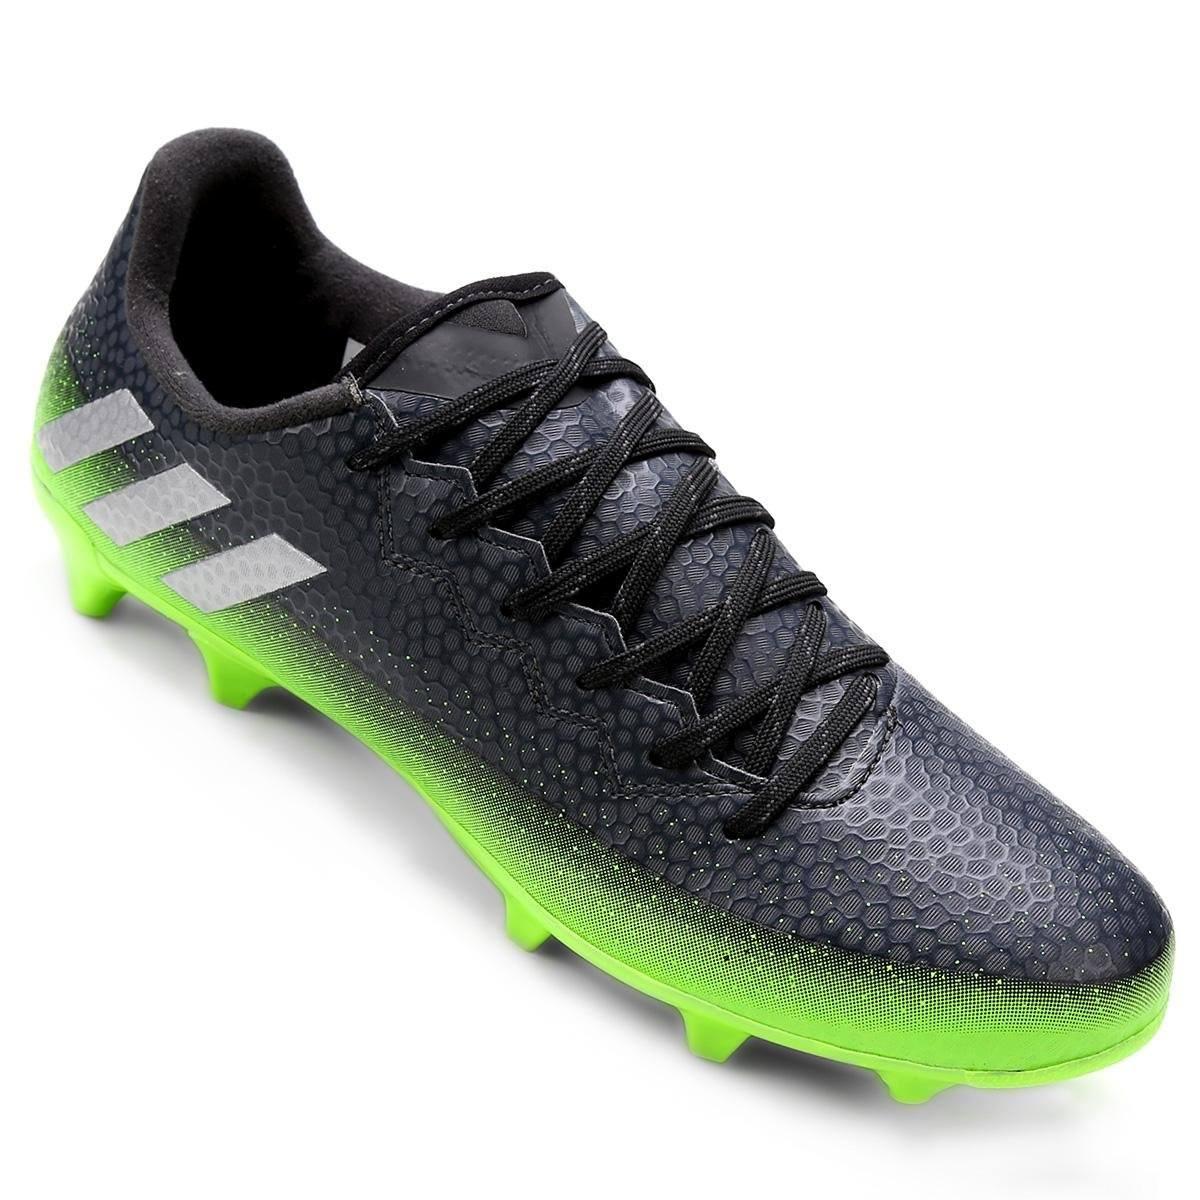 Chuteira Campo Adidas Messi 16.3 FG